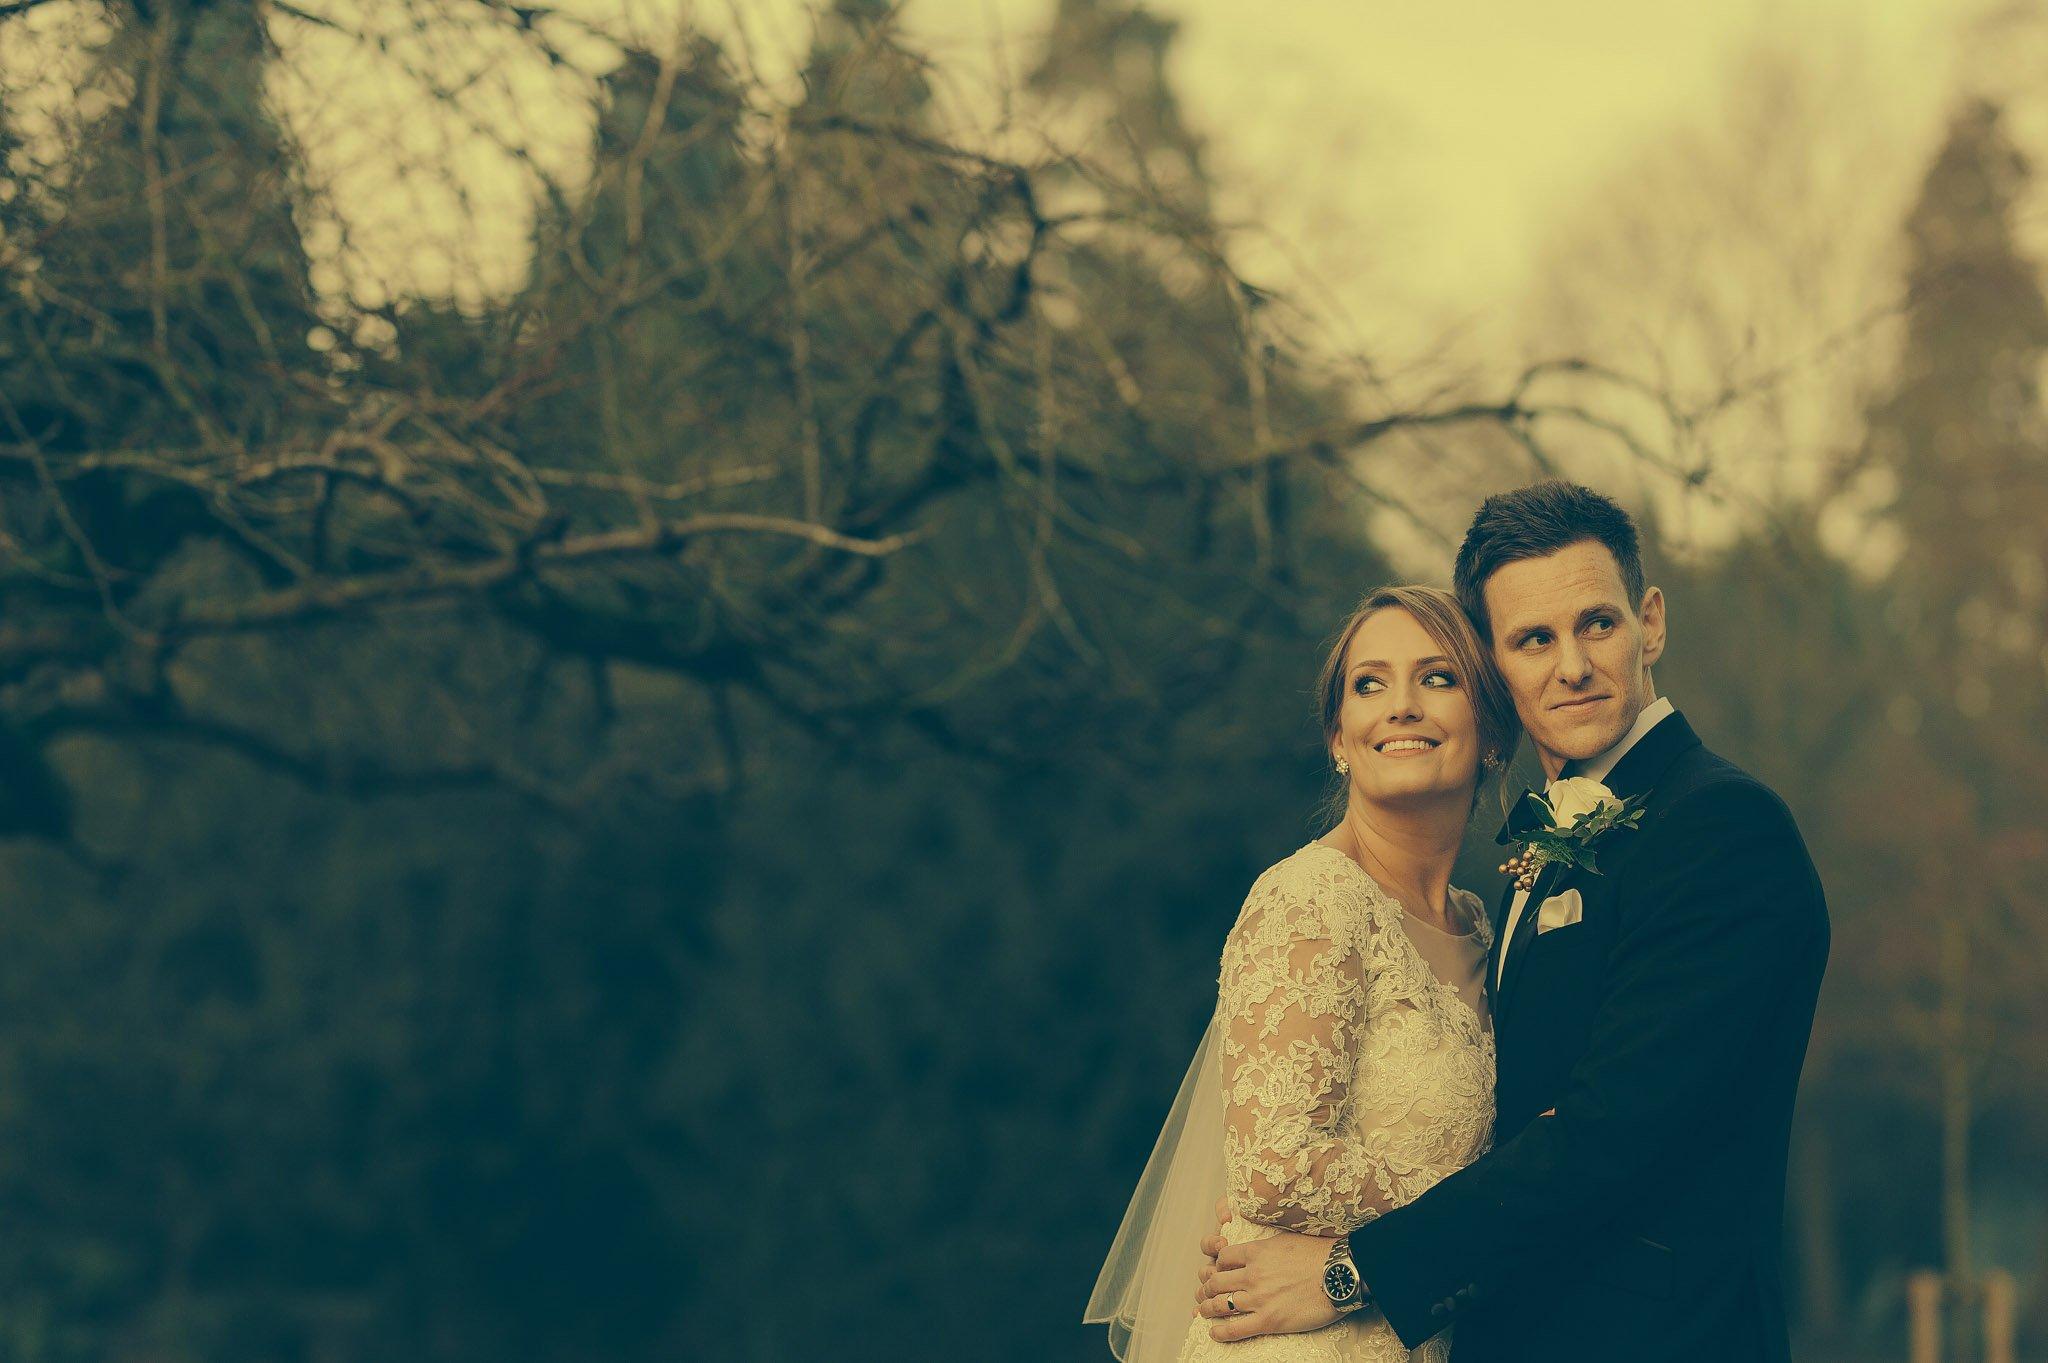 Coombe Abbey wedding in Coventry, Warwickshire - Sam + Matt 51